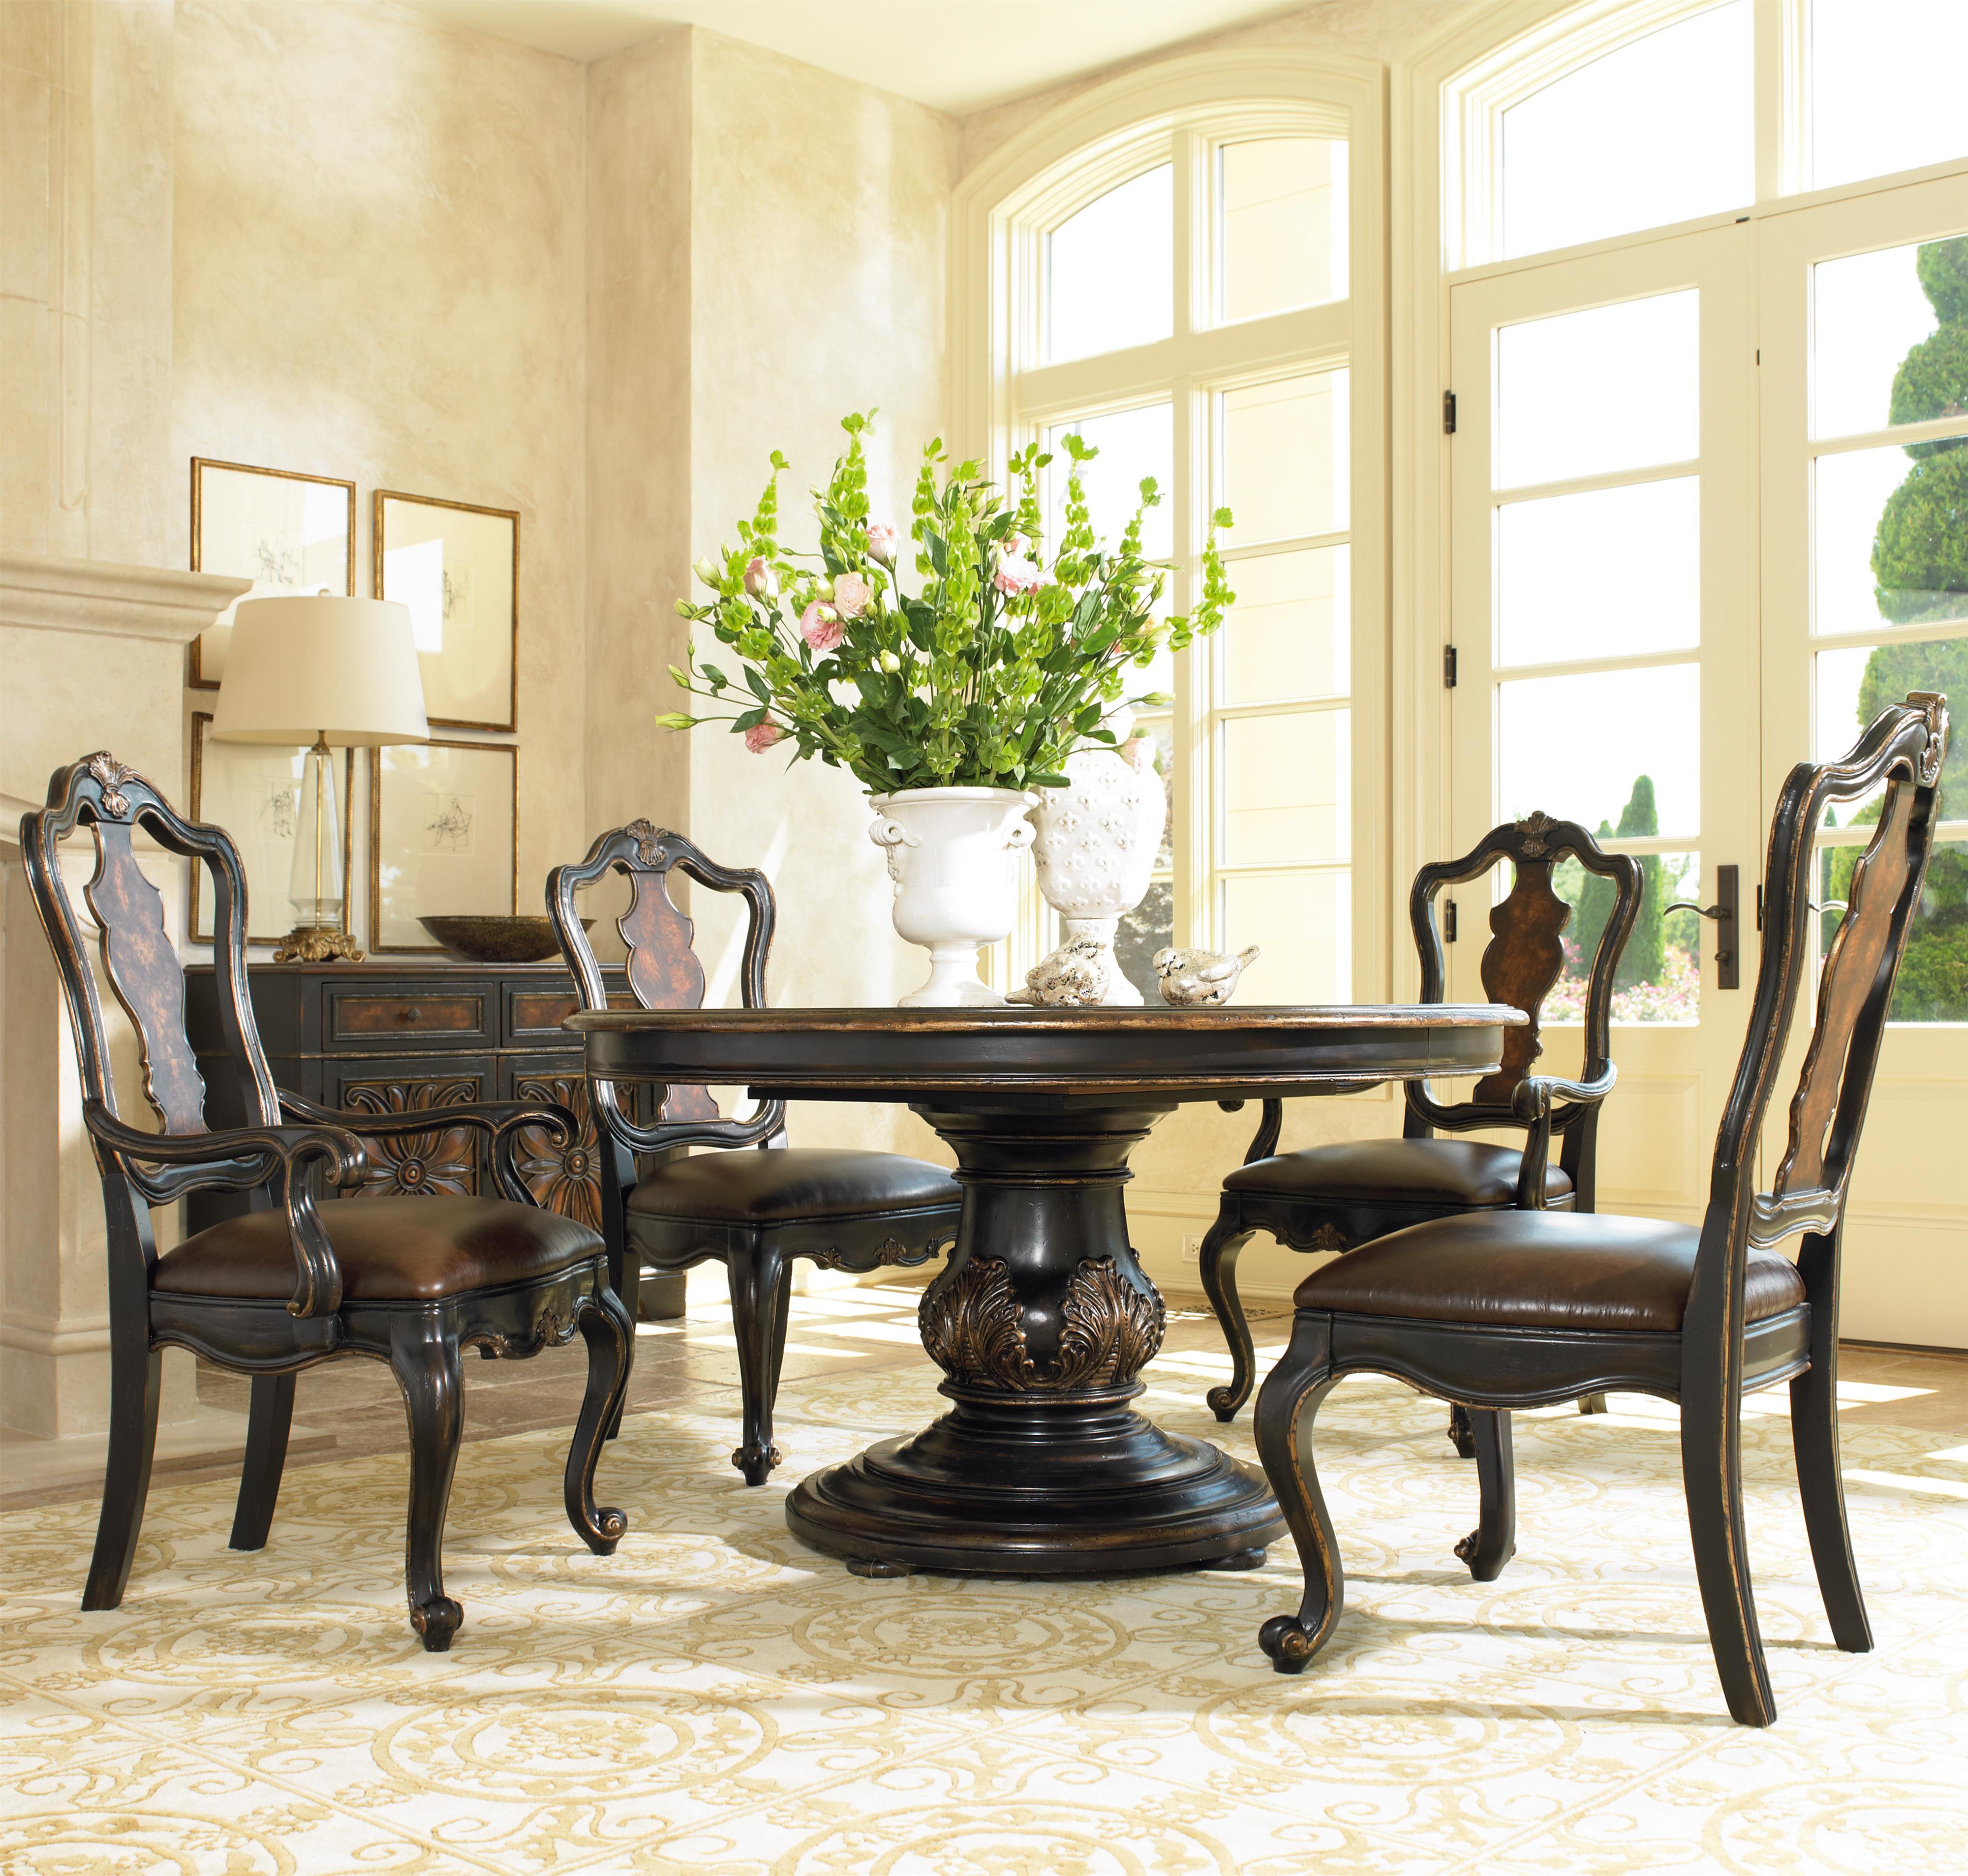 Hooker Furniture Grandover 2 Drawer Locking Lateral File | Wayside Furniture  | Lateral File